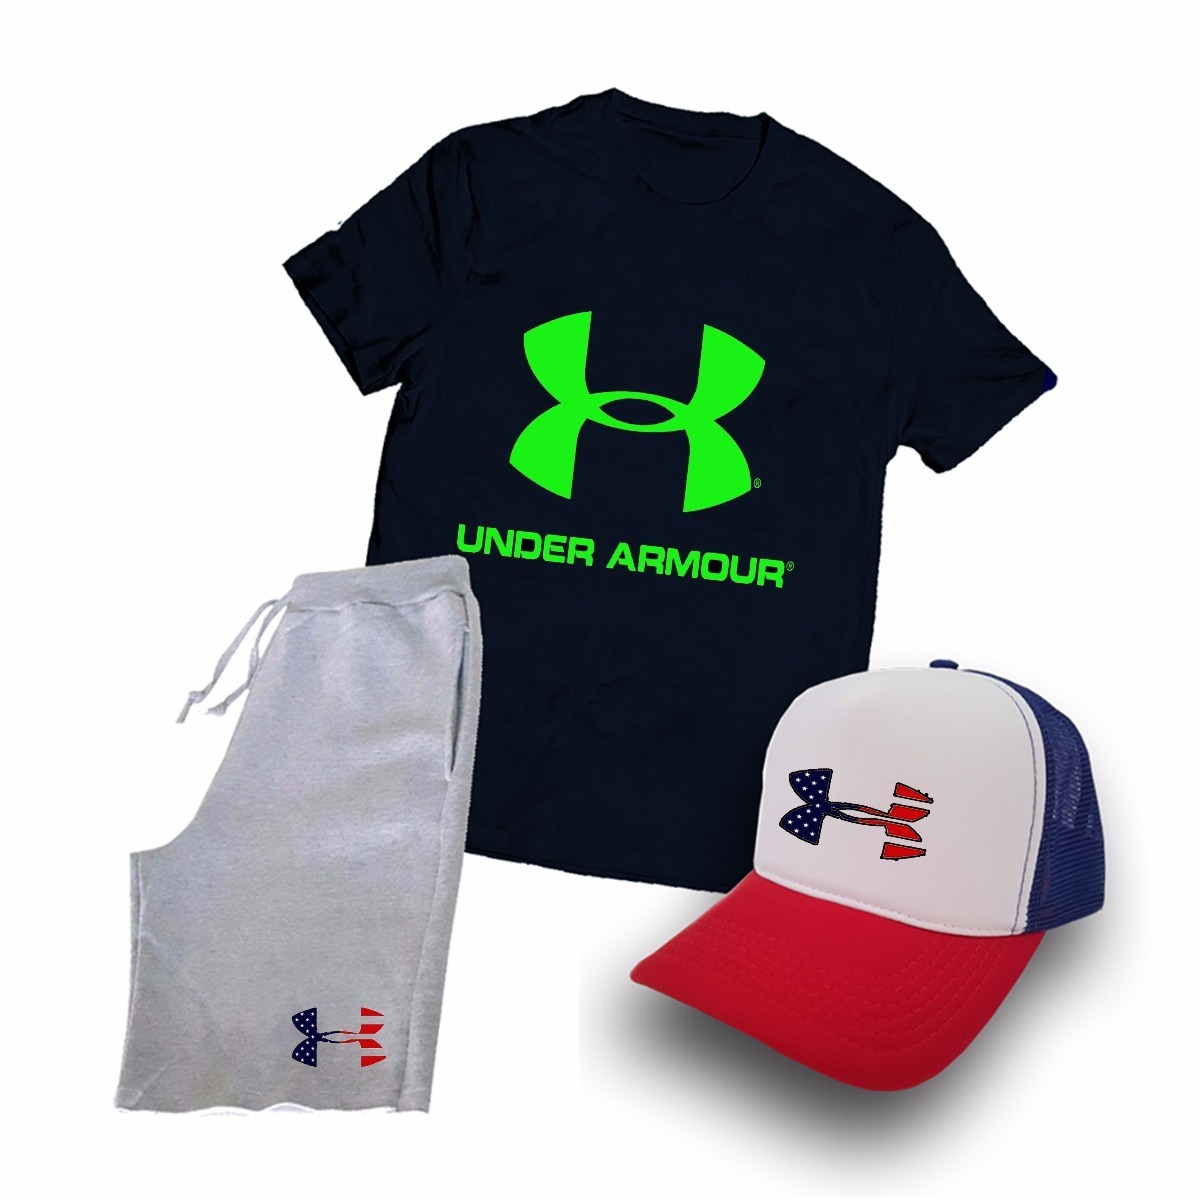 2bb9beb06ad2f kit under armour marca camiseta + boné + bermuda jogo. Carregando zoom.